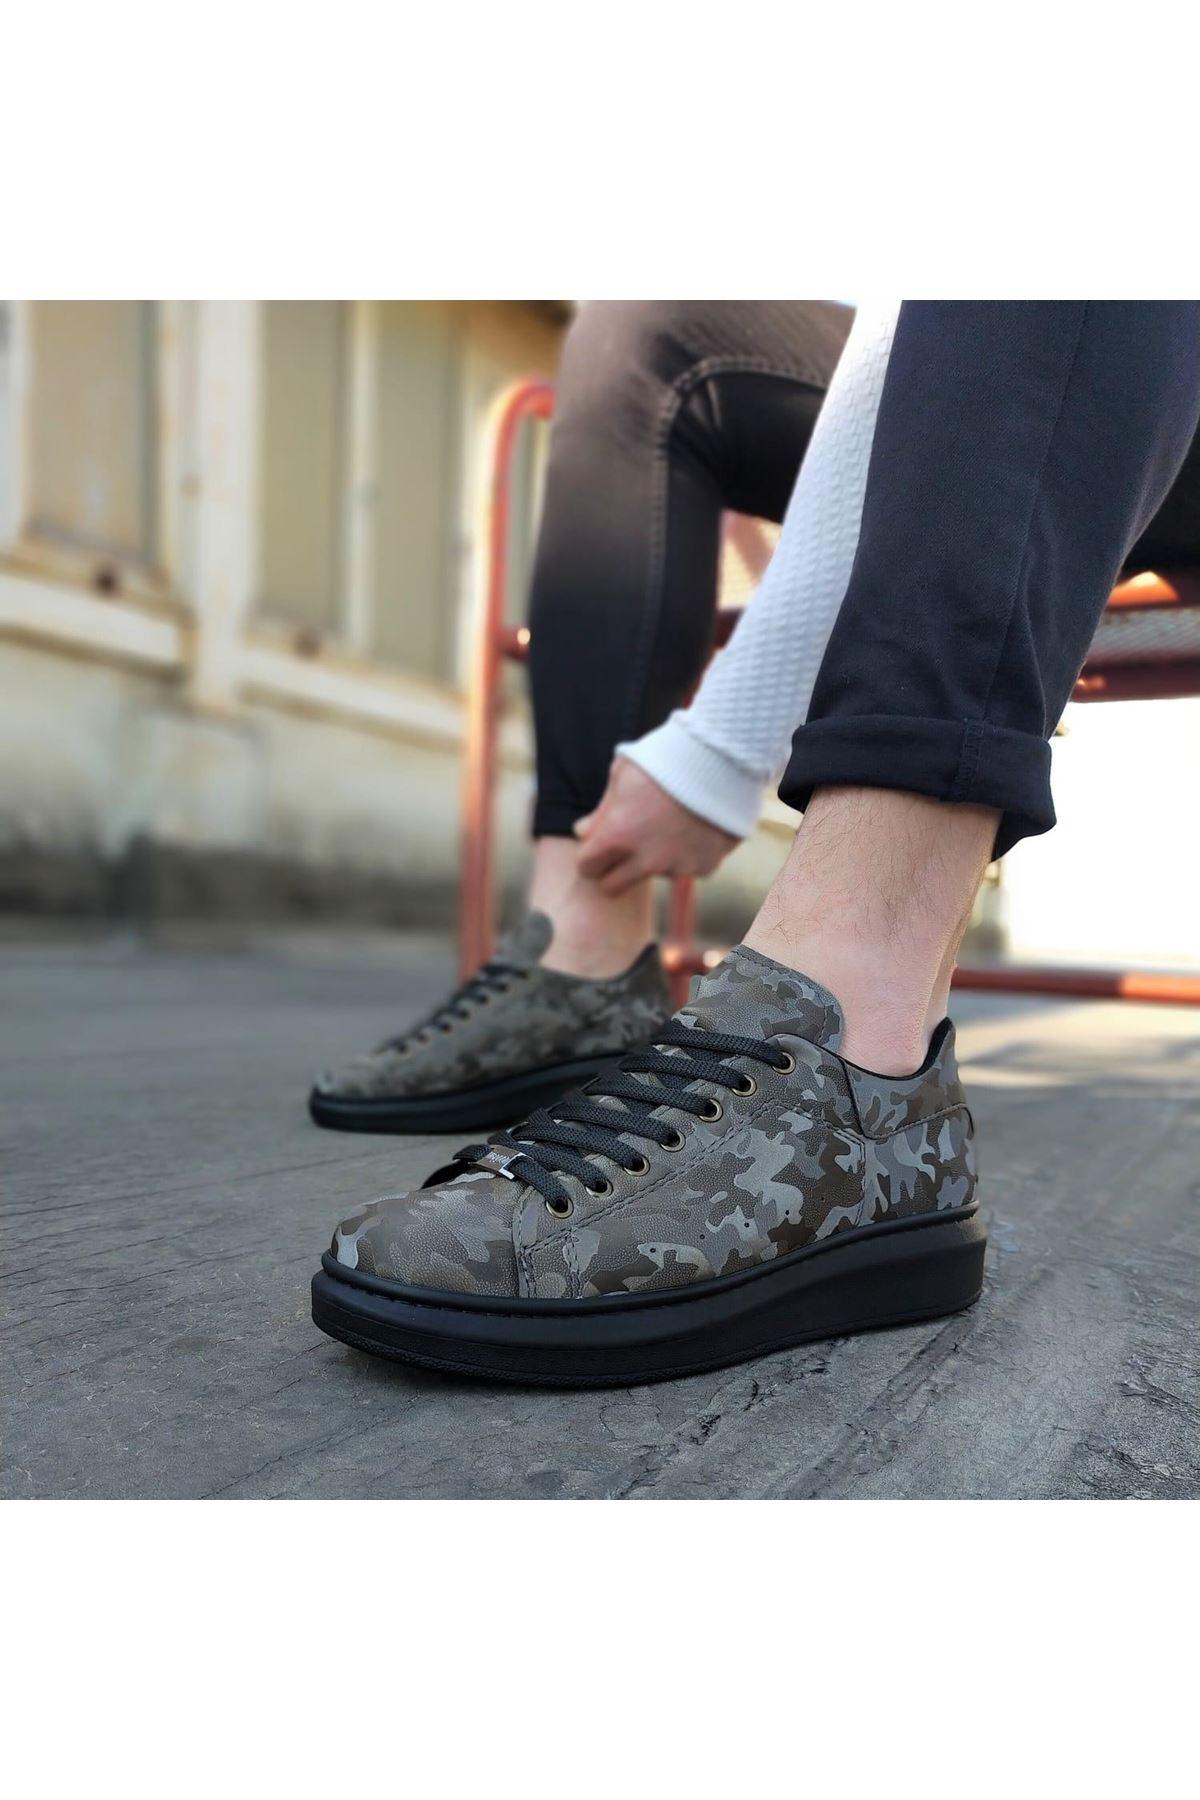 Wagoon WG501 Gri Siyah Hologram Erkek Yüksek Taban  Ayakkabı